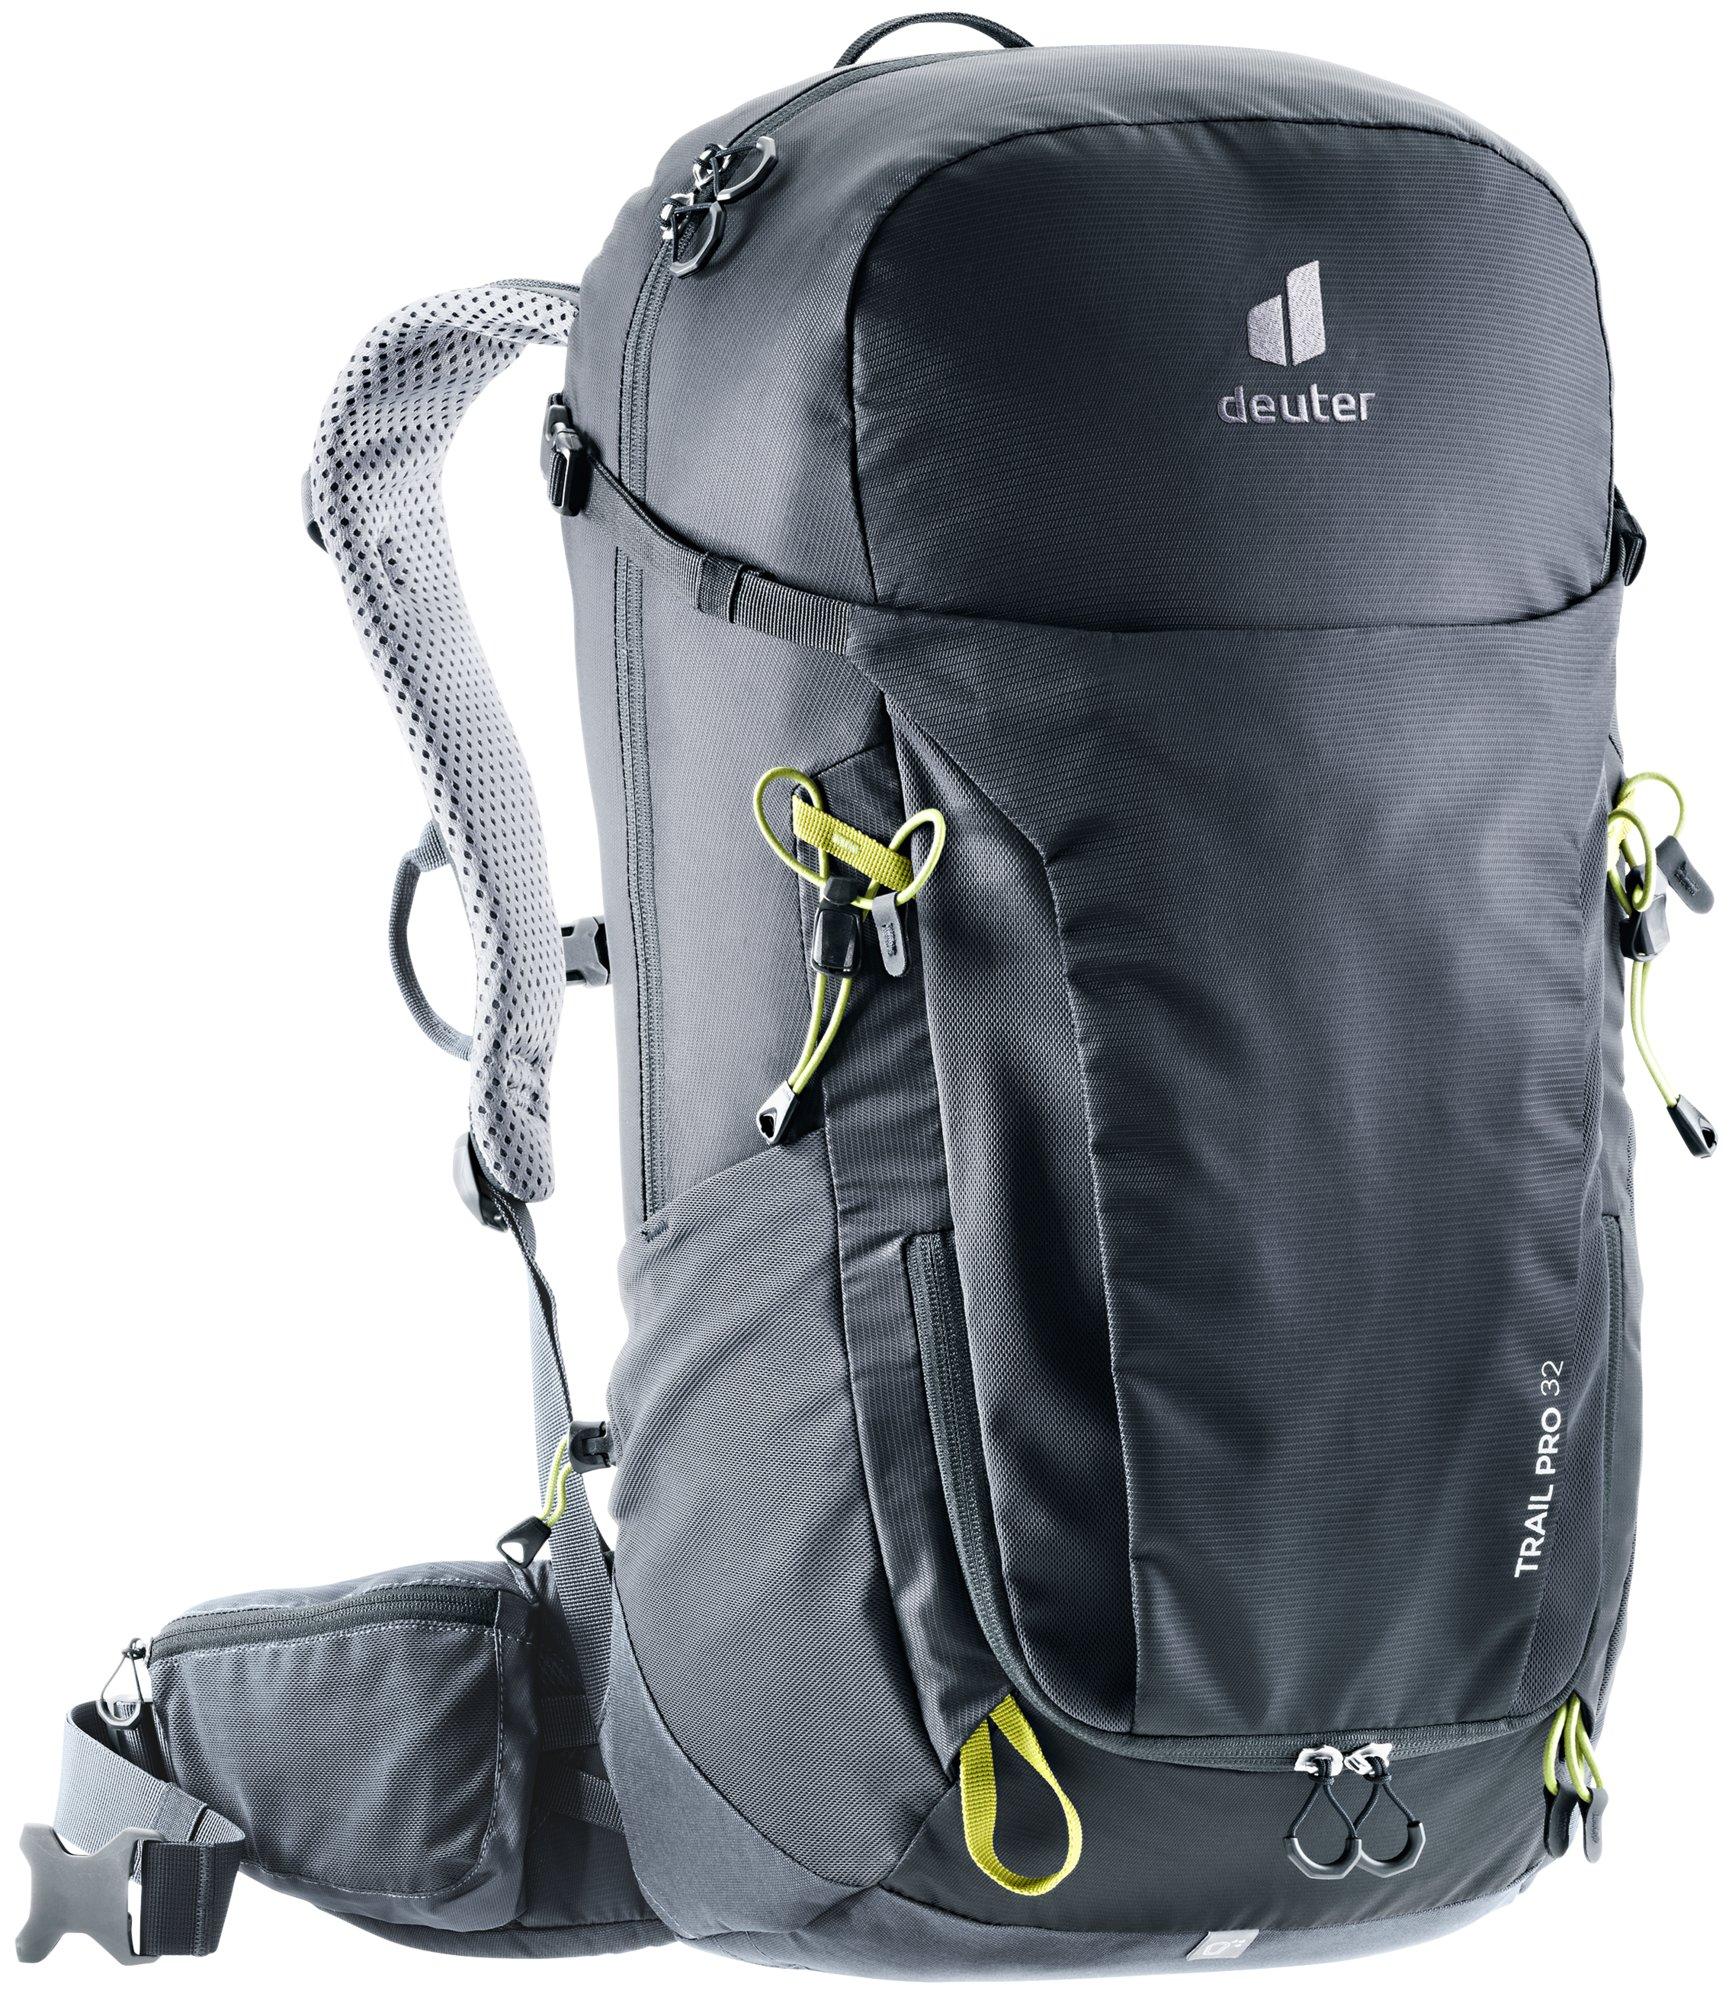 Deuter - Trail Pro 32, Wanderrucksack